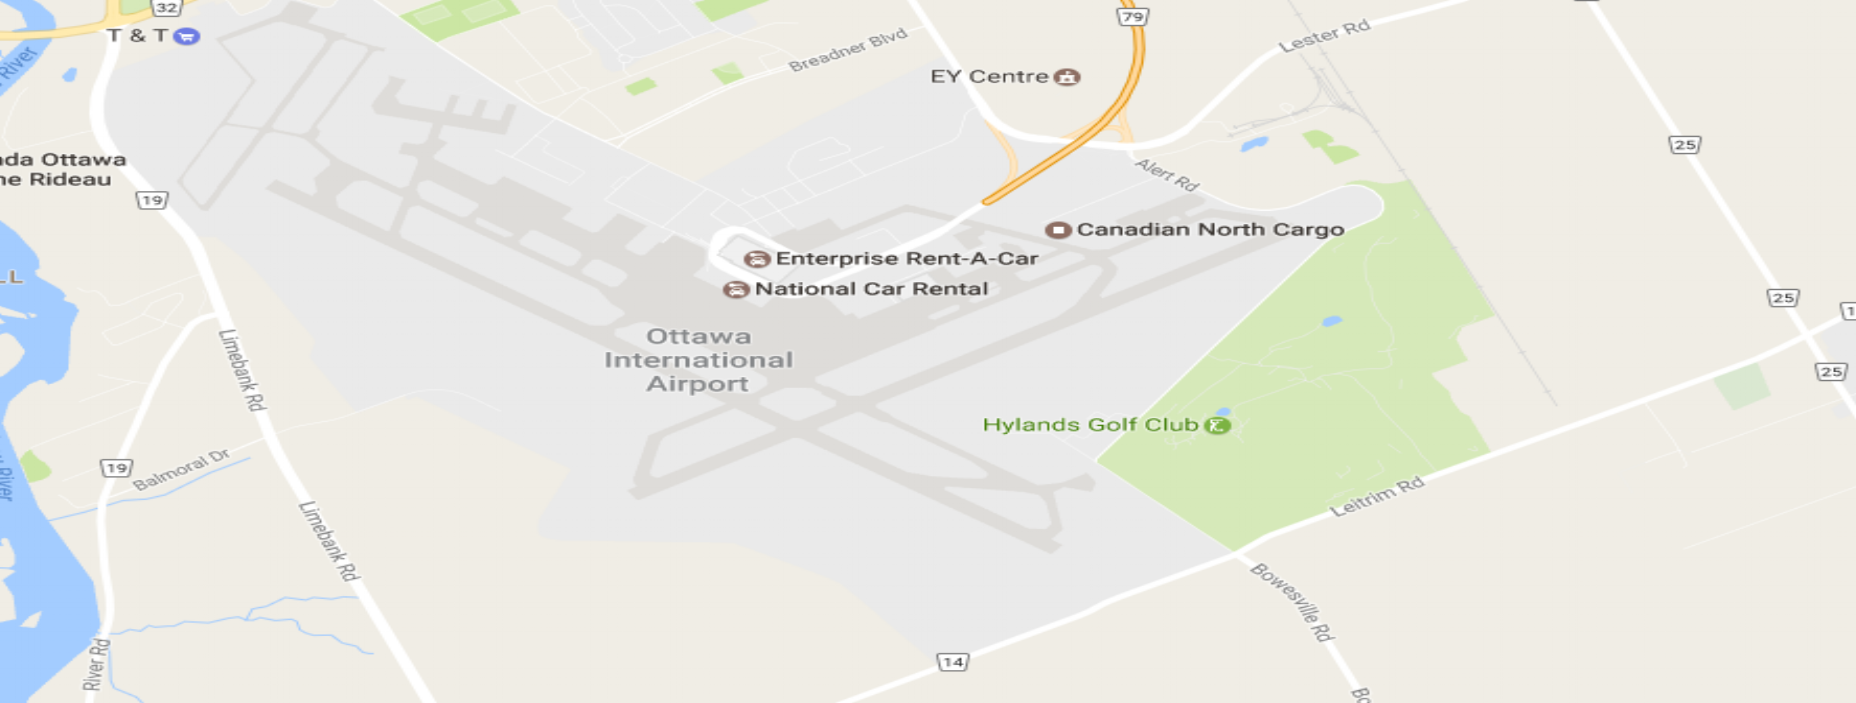 ottawa yow airport.png